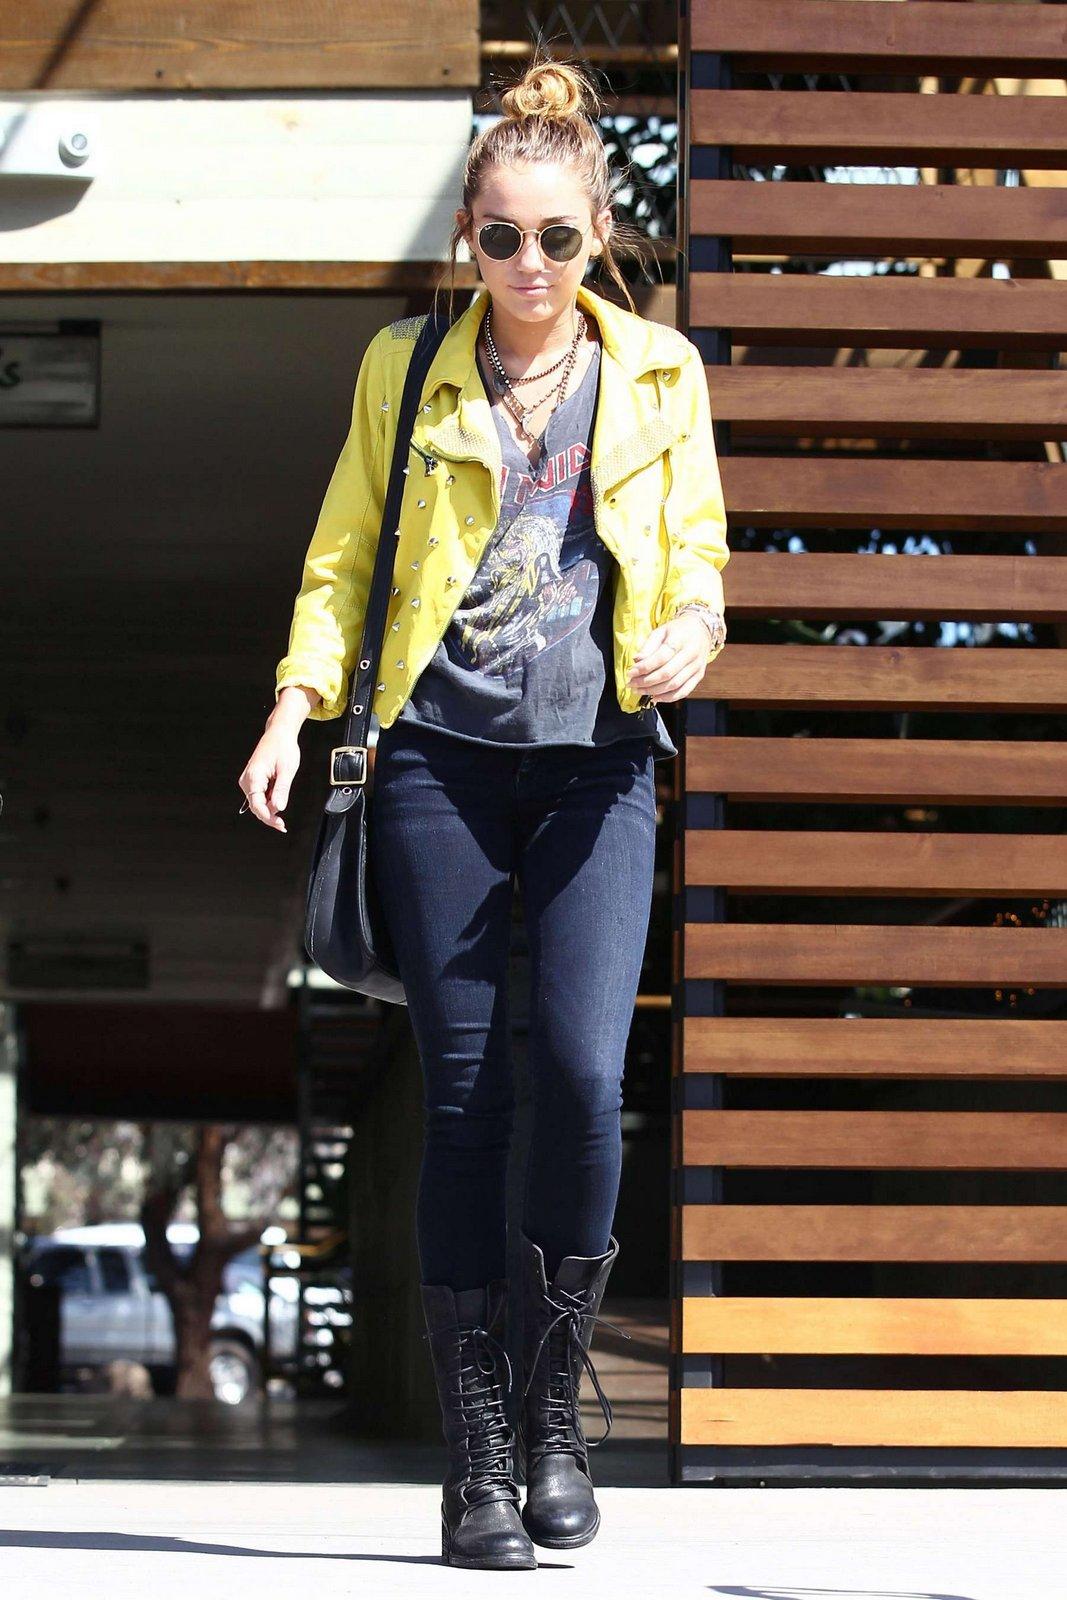 http://2.bp.blogspot.com/-p011NIctZa0/T6BViILzznI/AAAAAAAAExg/Bp3-BlaRJoM/s1600/Miley%2BCyrus-celebutopia-CD041009.jpg